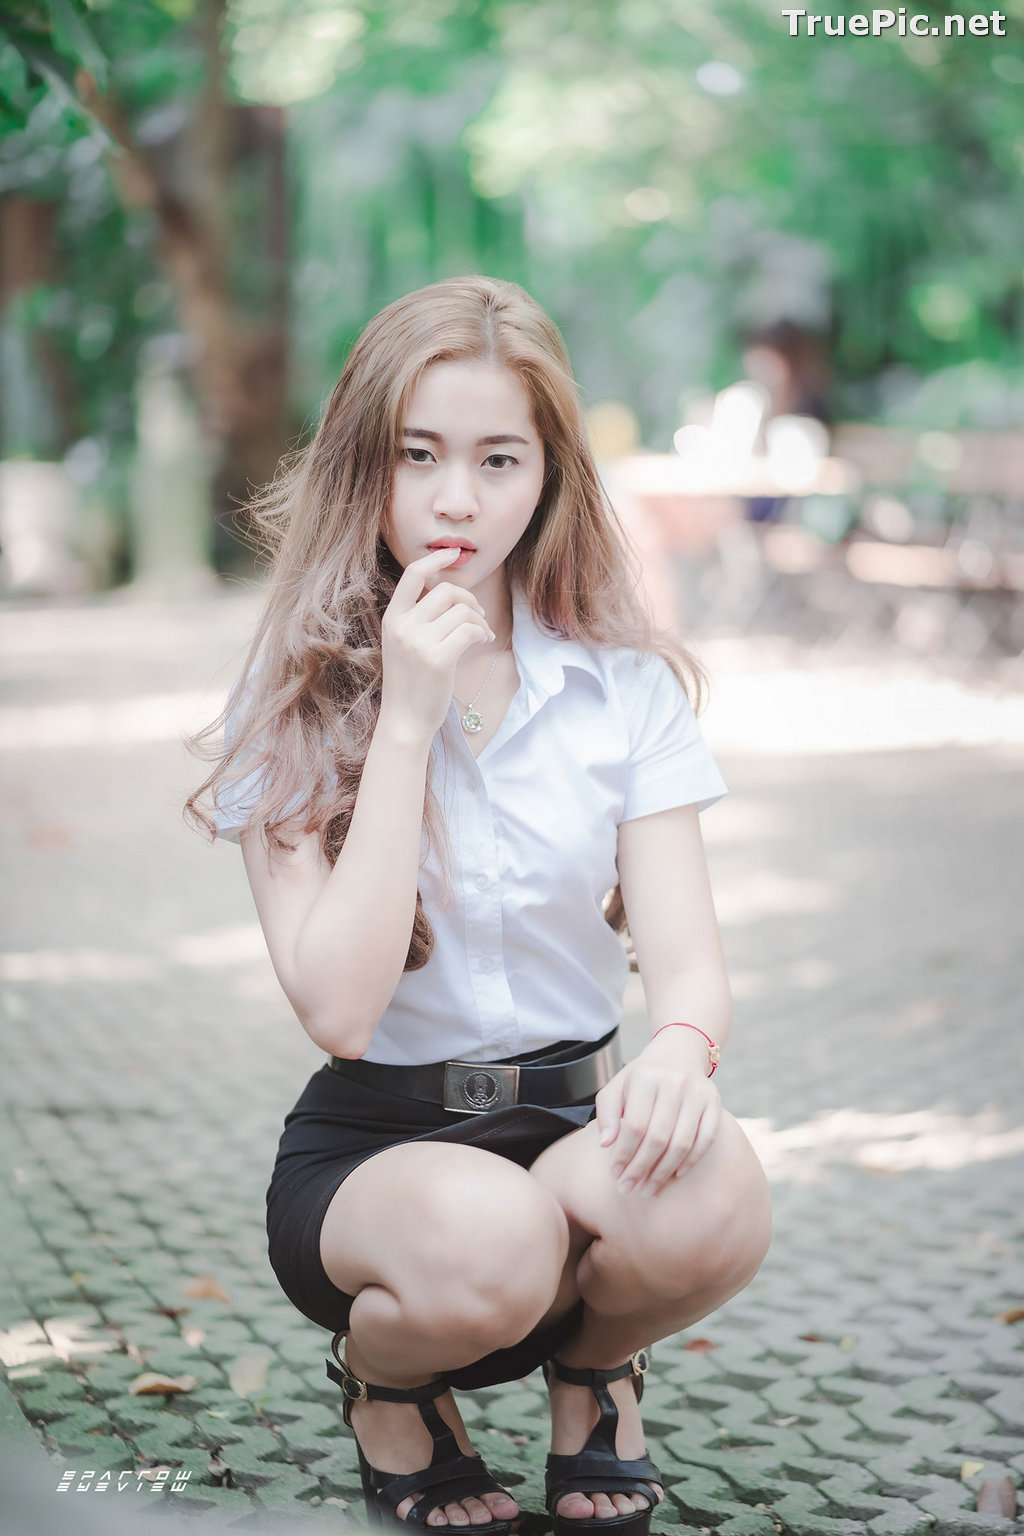 Image Thailand Model - นิภาภรณ์ เลิศนิติวัฒนา - Student Uniform - TruePic.net - Picture-2